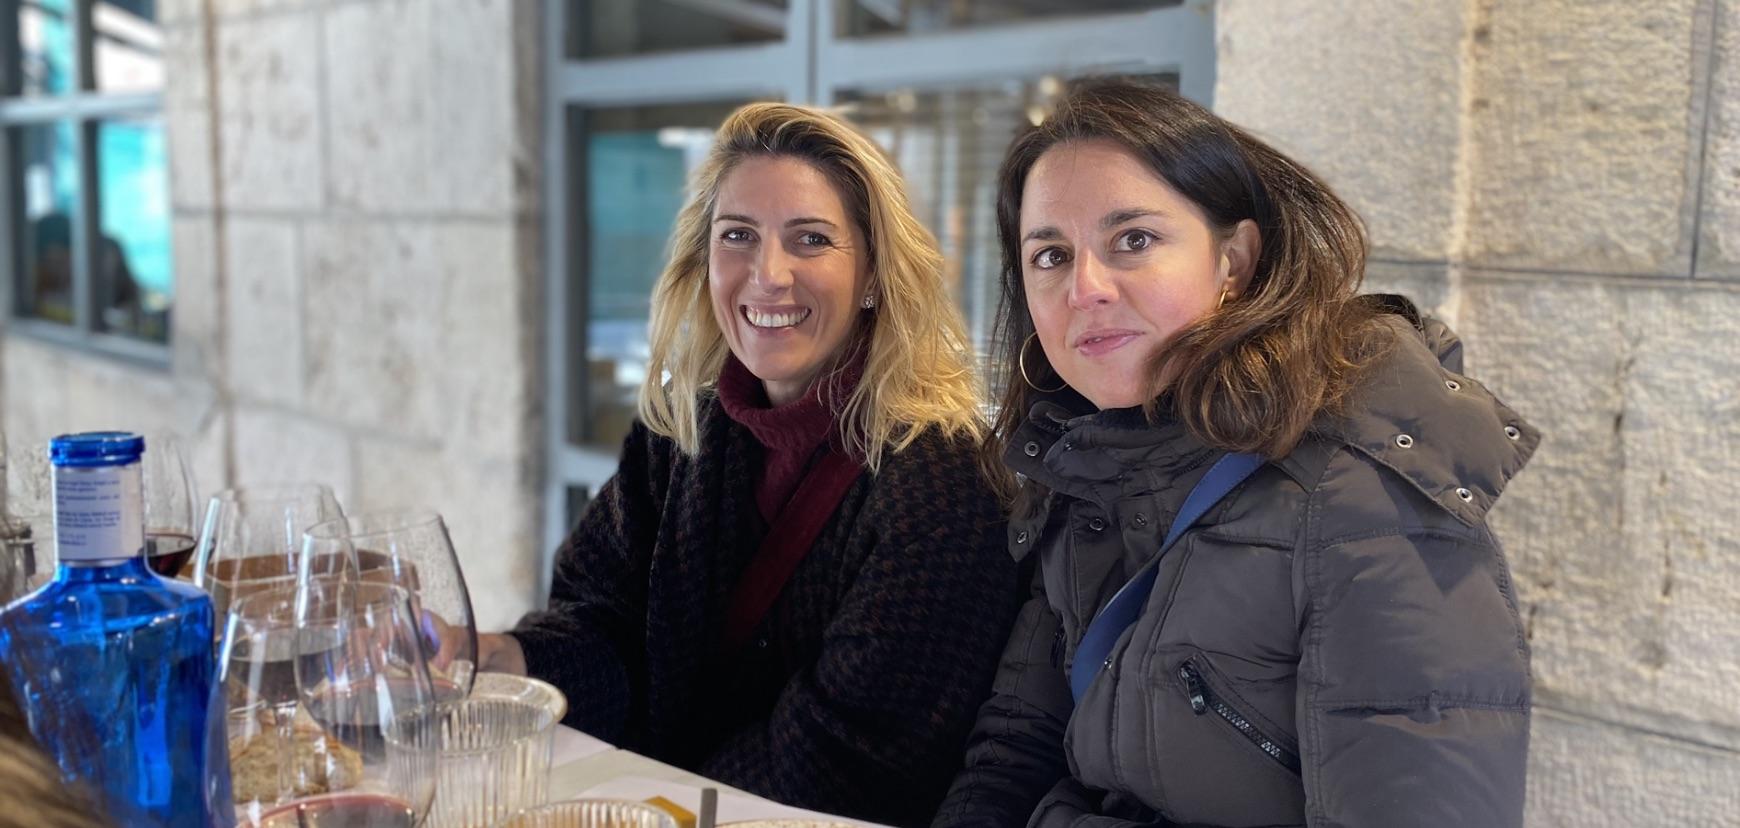 Rebeca y Cristina